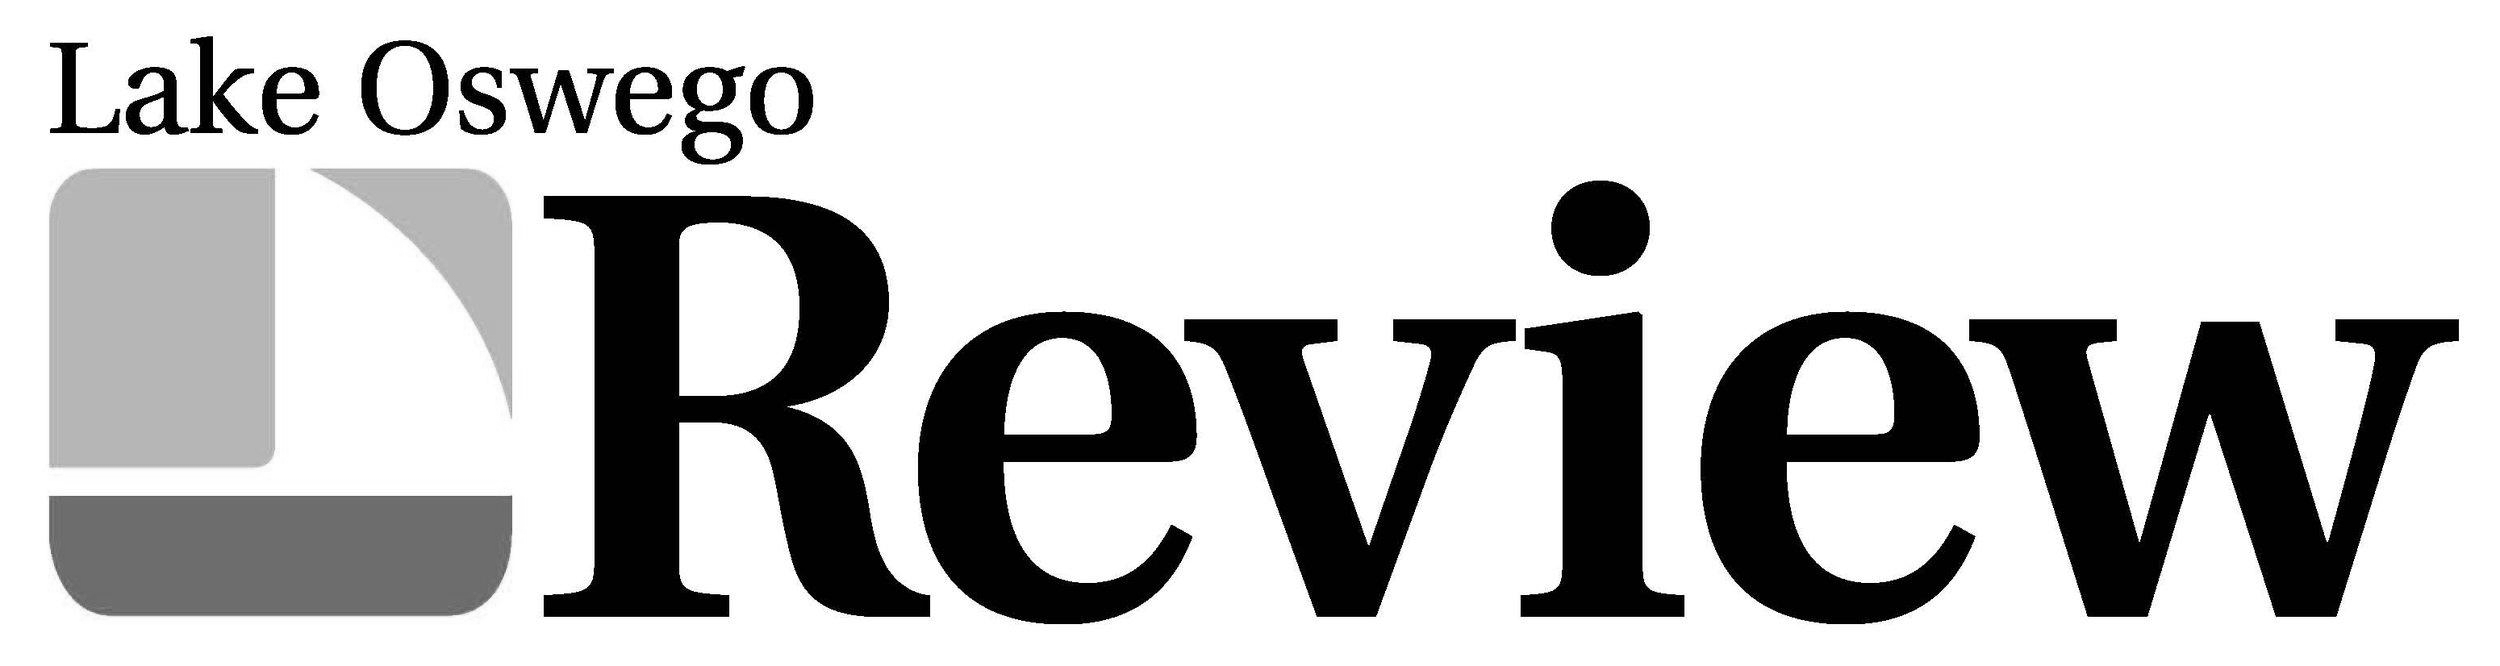 LOR Logo.jpg